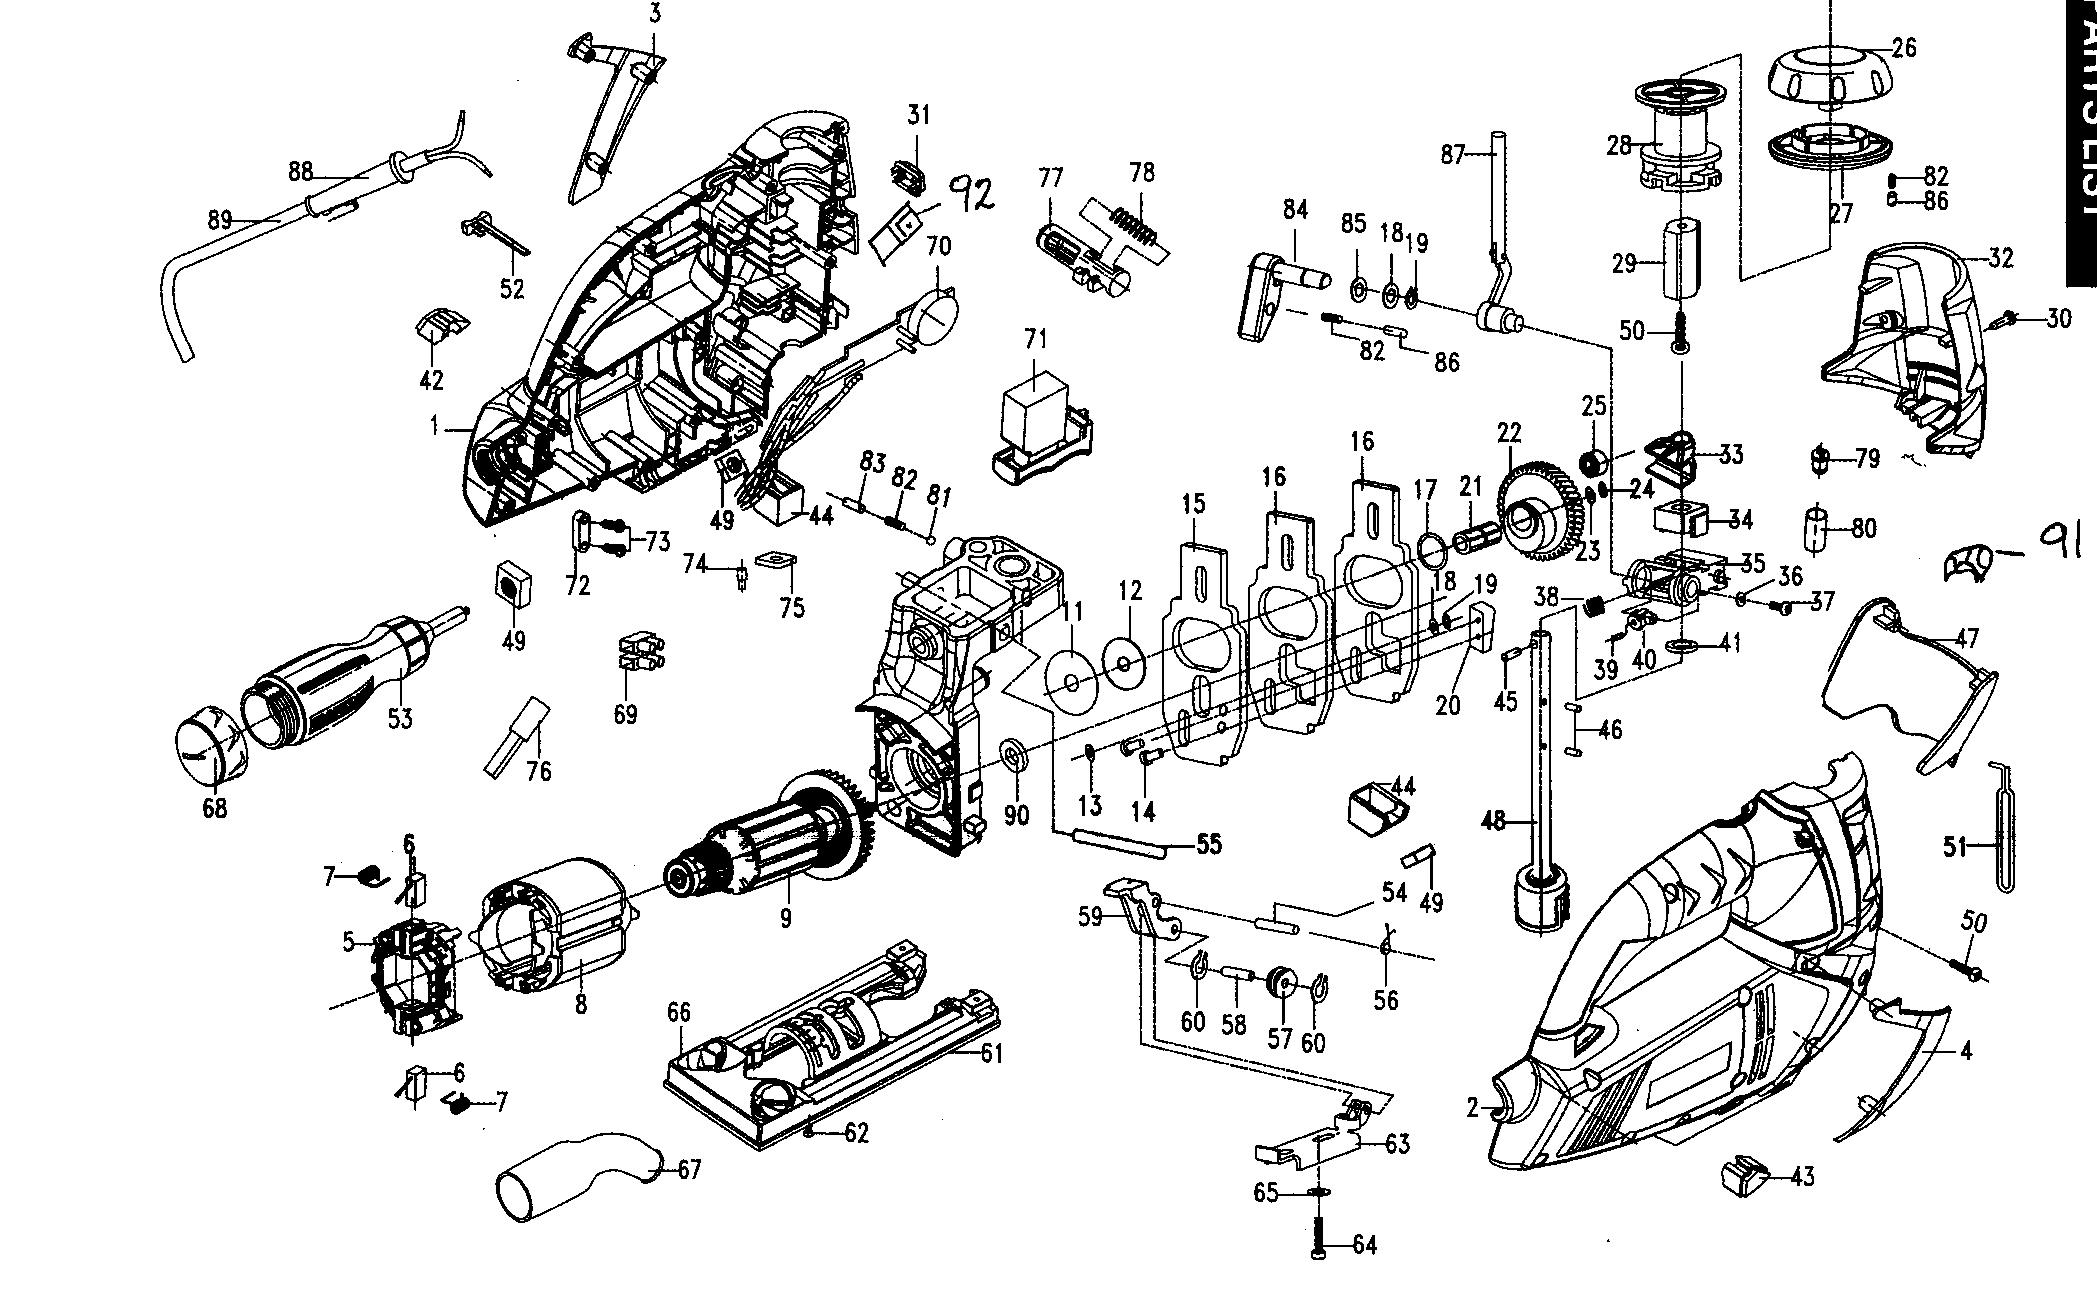 Craftsman model 32017256 saw sabre genuine parts